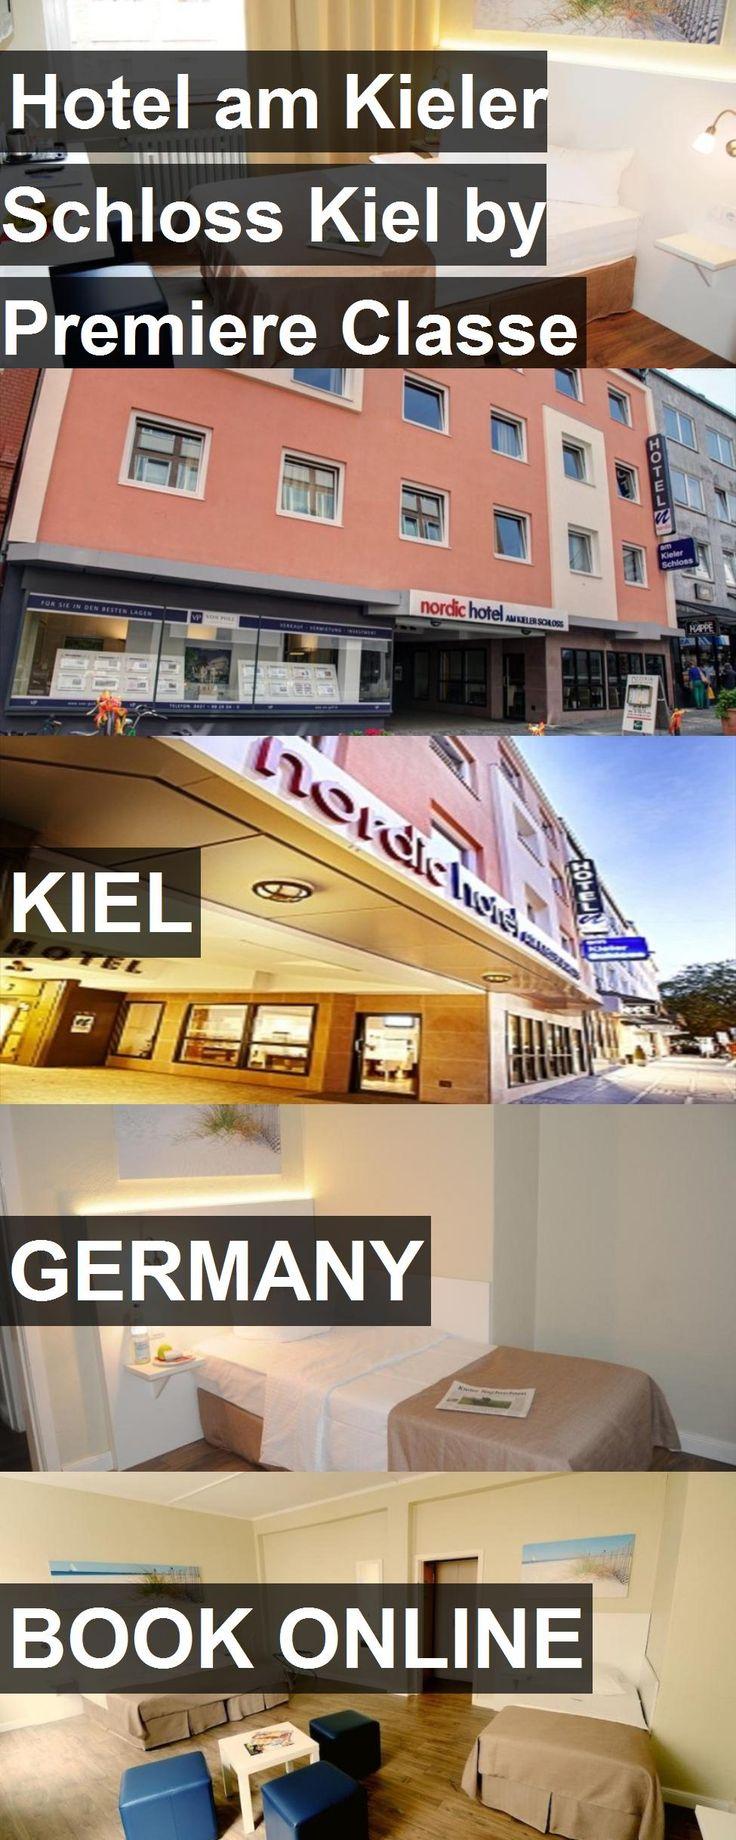 Hotel am Kieler Schloss Kiel by Premiere Classe in Kiel, Germany. For more information, photos, reviews and best prices please follow the link. #Germany #Kiel #travel #vacation #hotel